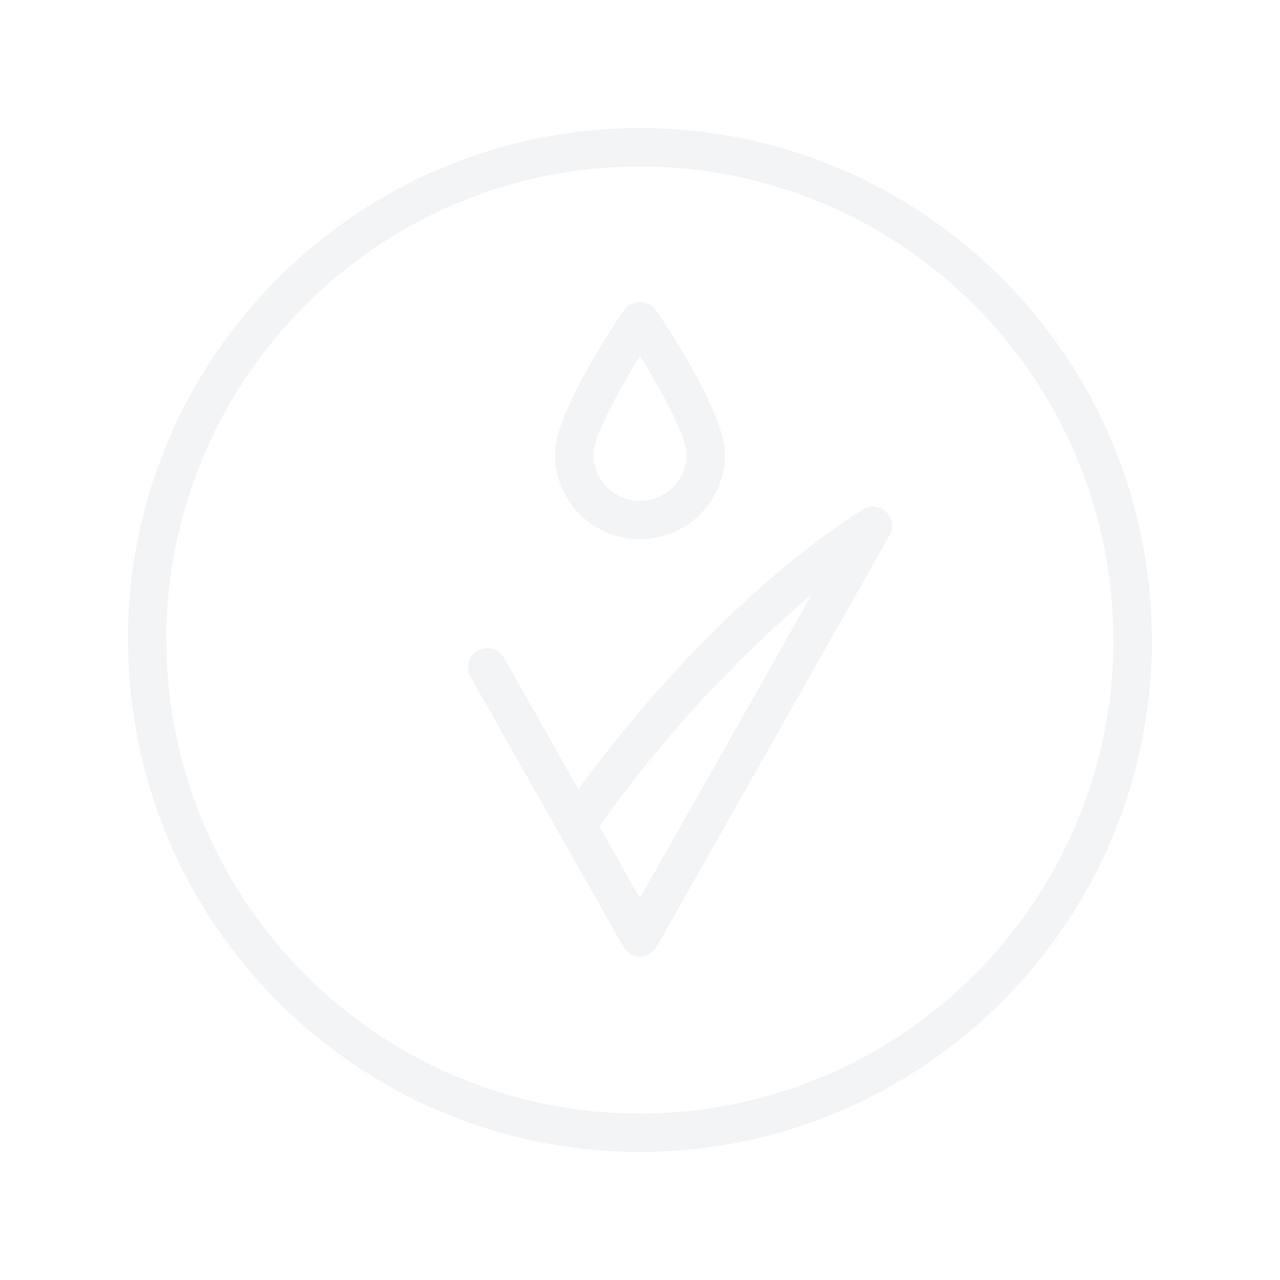 PALMER'S Cocoa Butter Moisturizing Day Cream SPF15 75ml